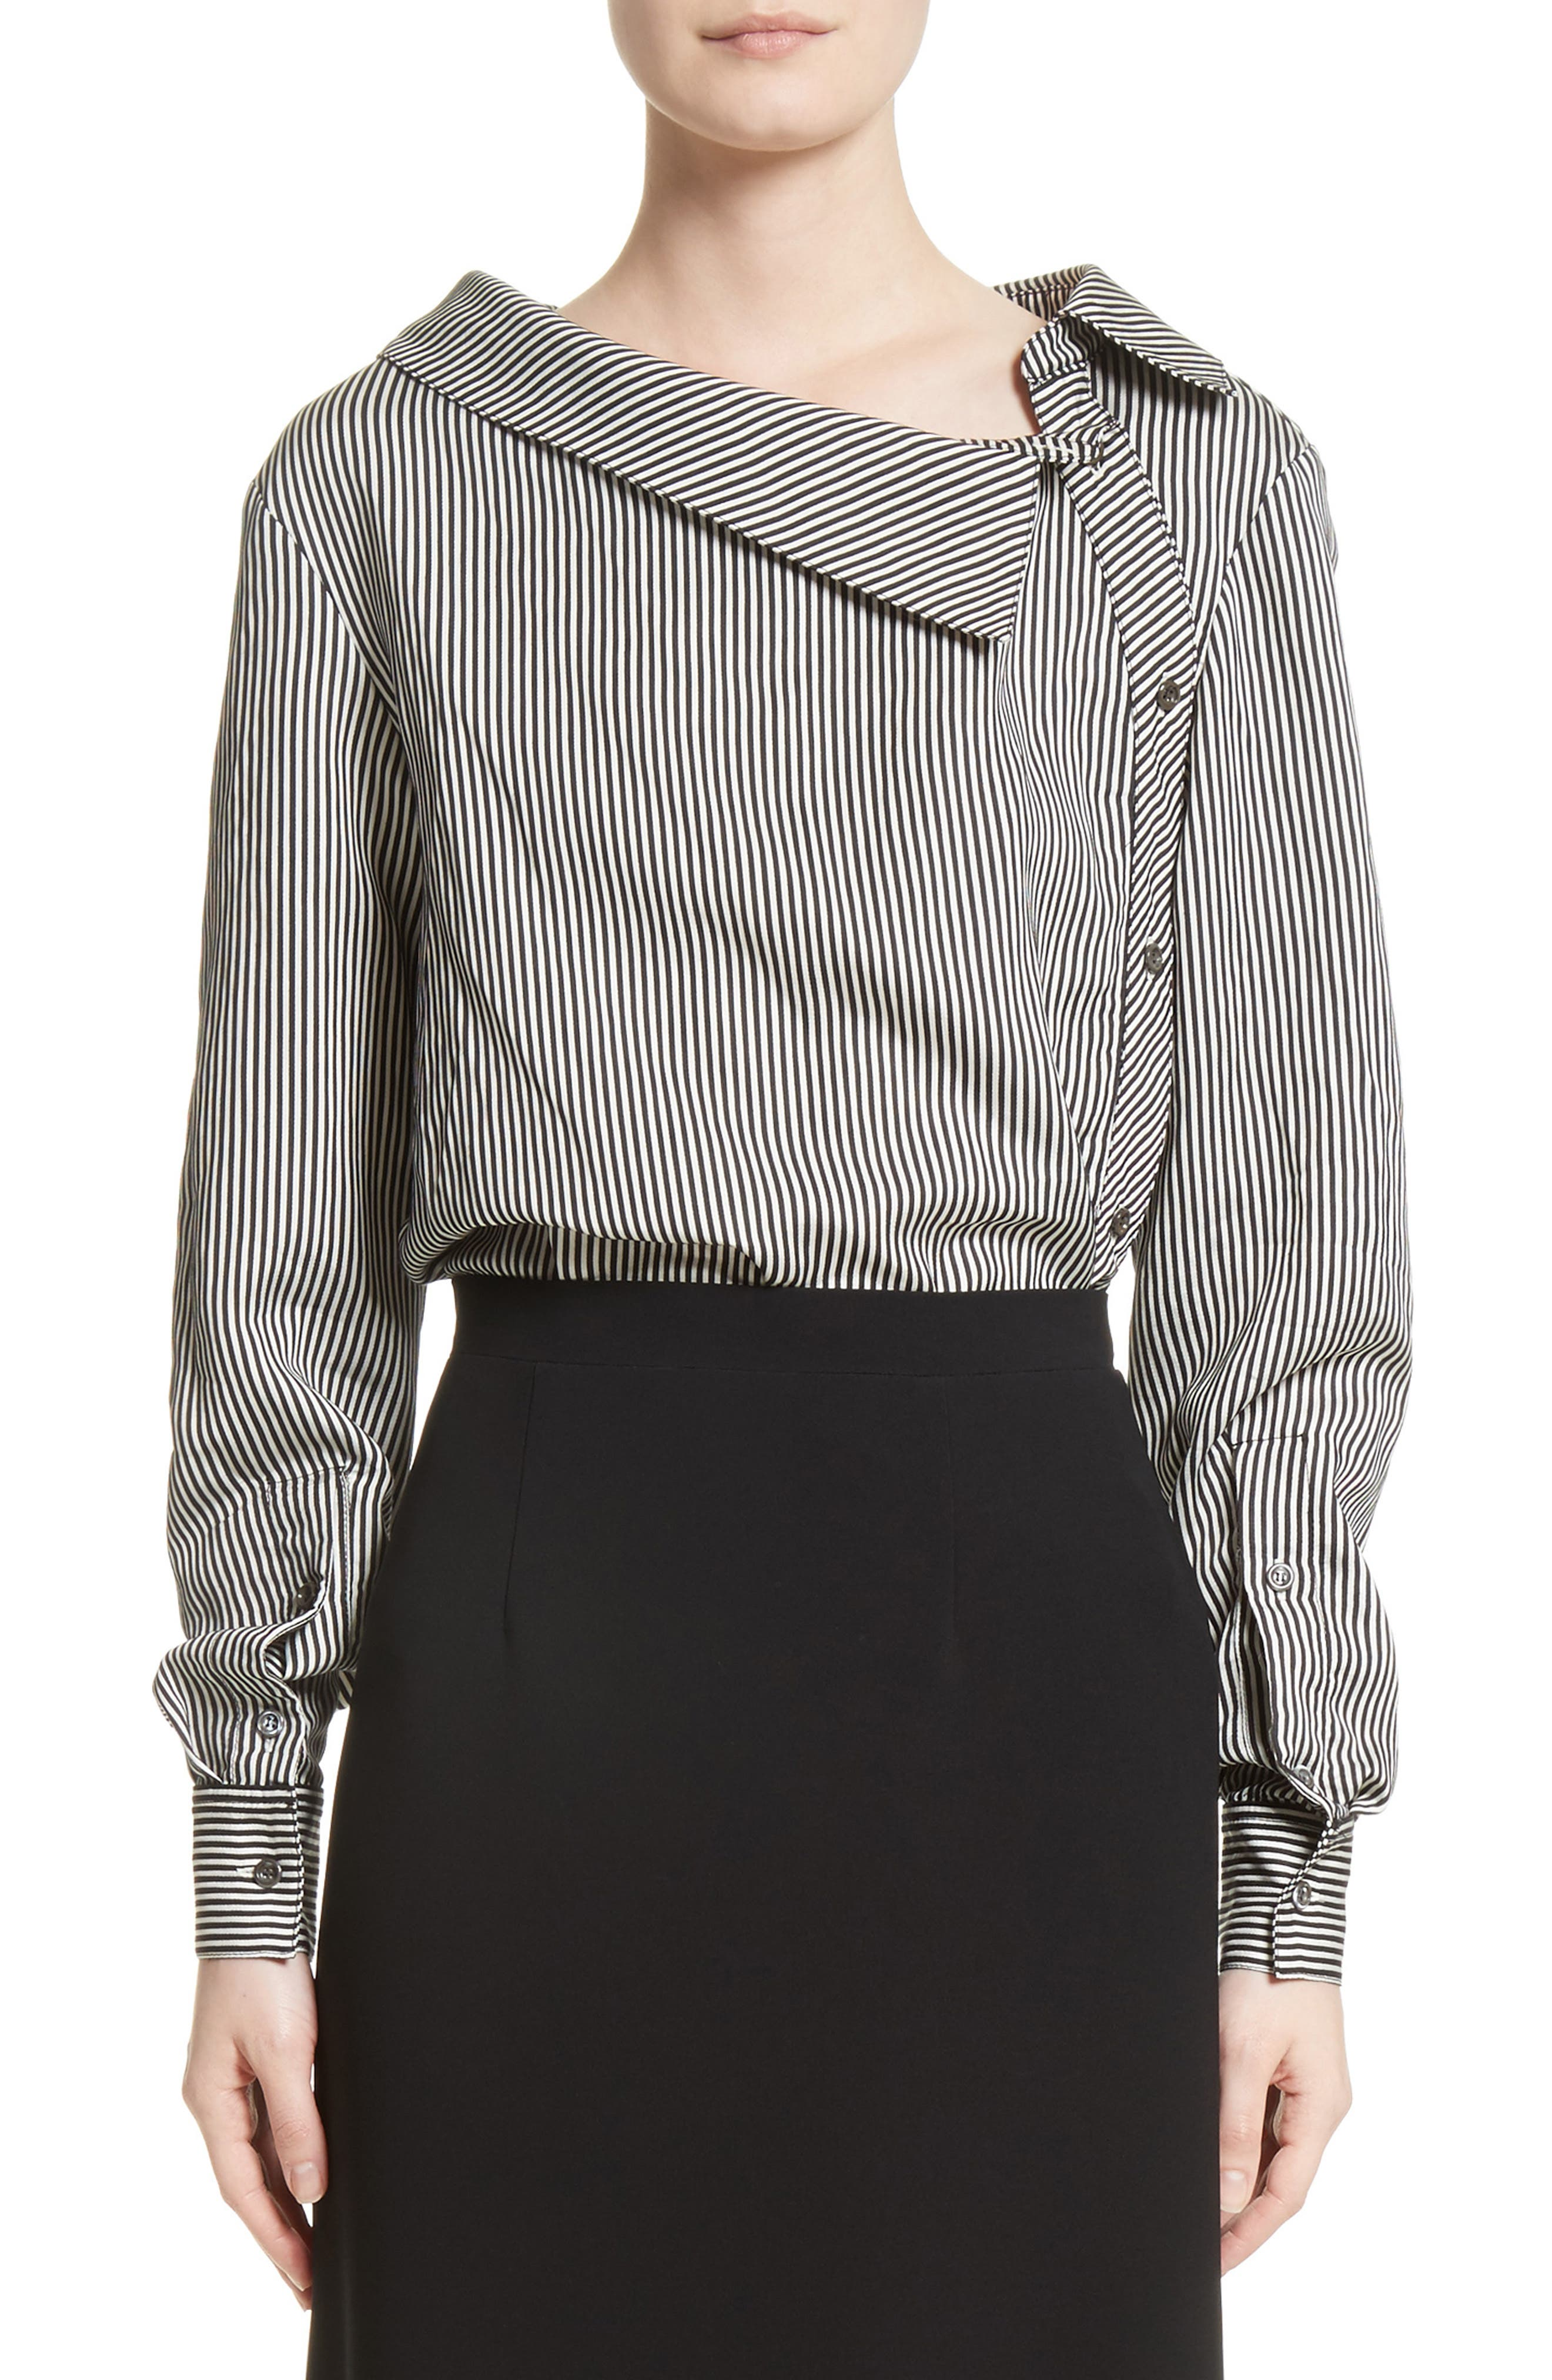 Alternate Image 1 Selected - Altuzarra Asymmetrical Pinstripe Shirt